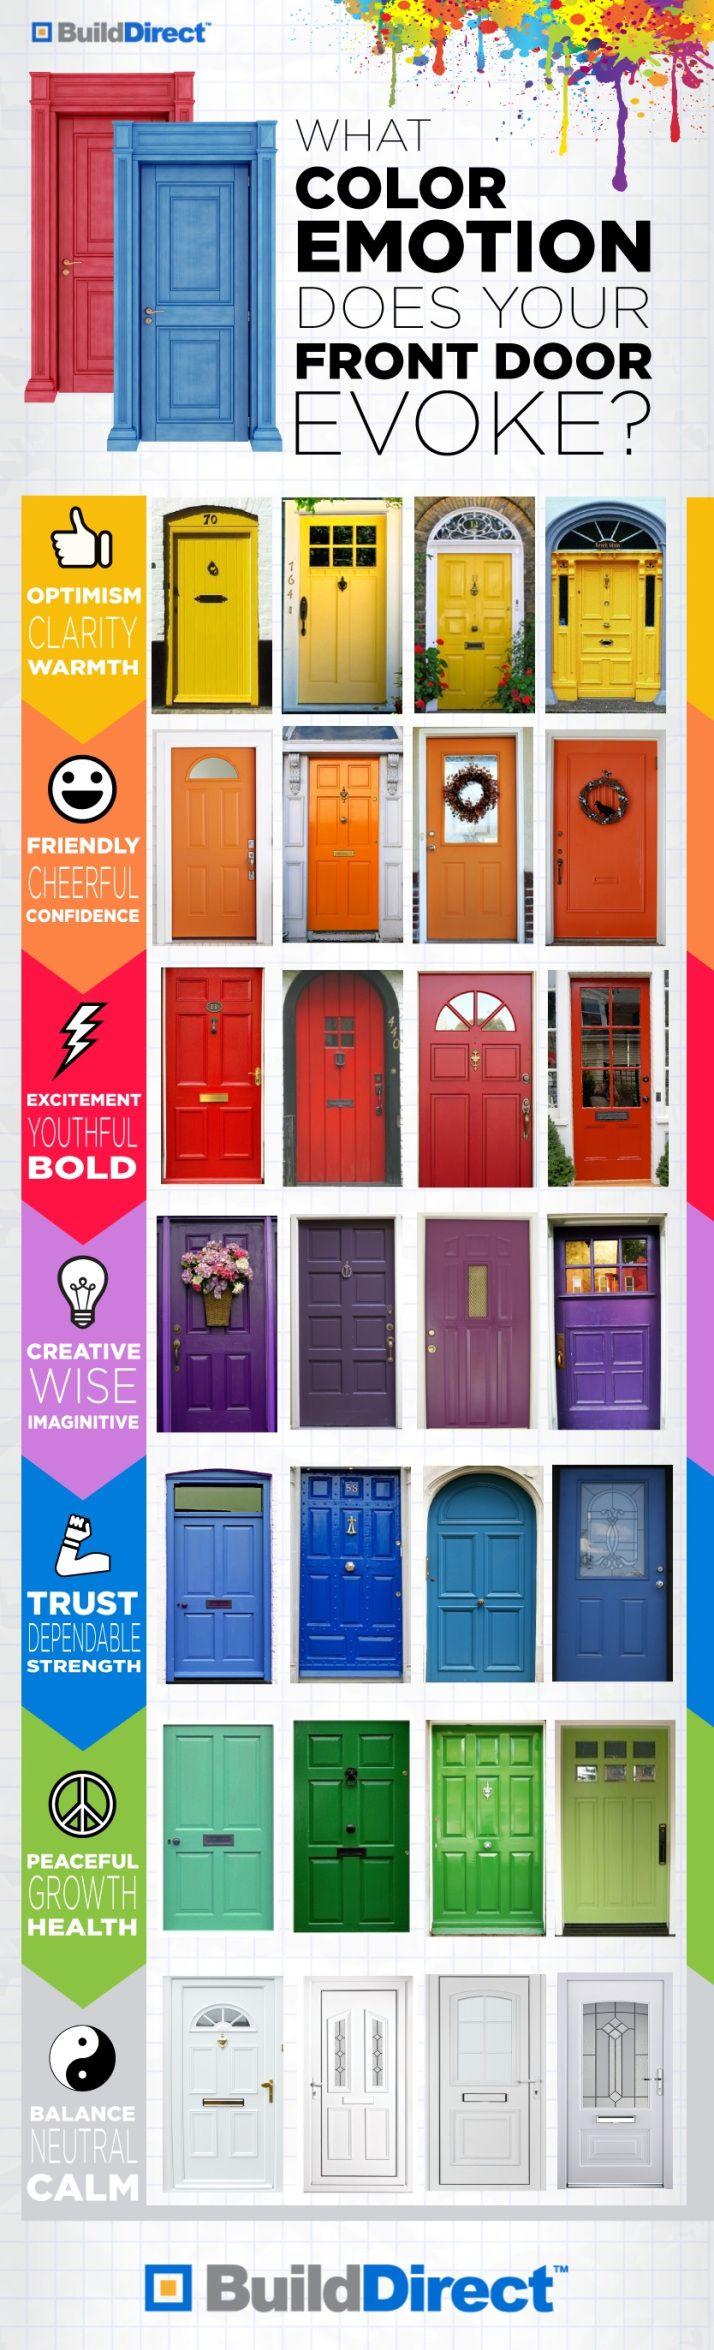 Dime el color de tu puerta y te diré como eres #infografia #infographic #design